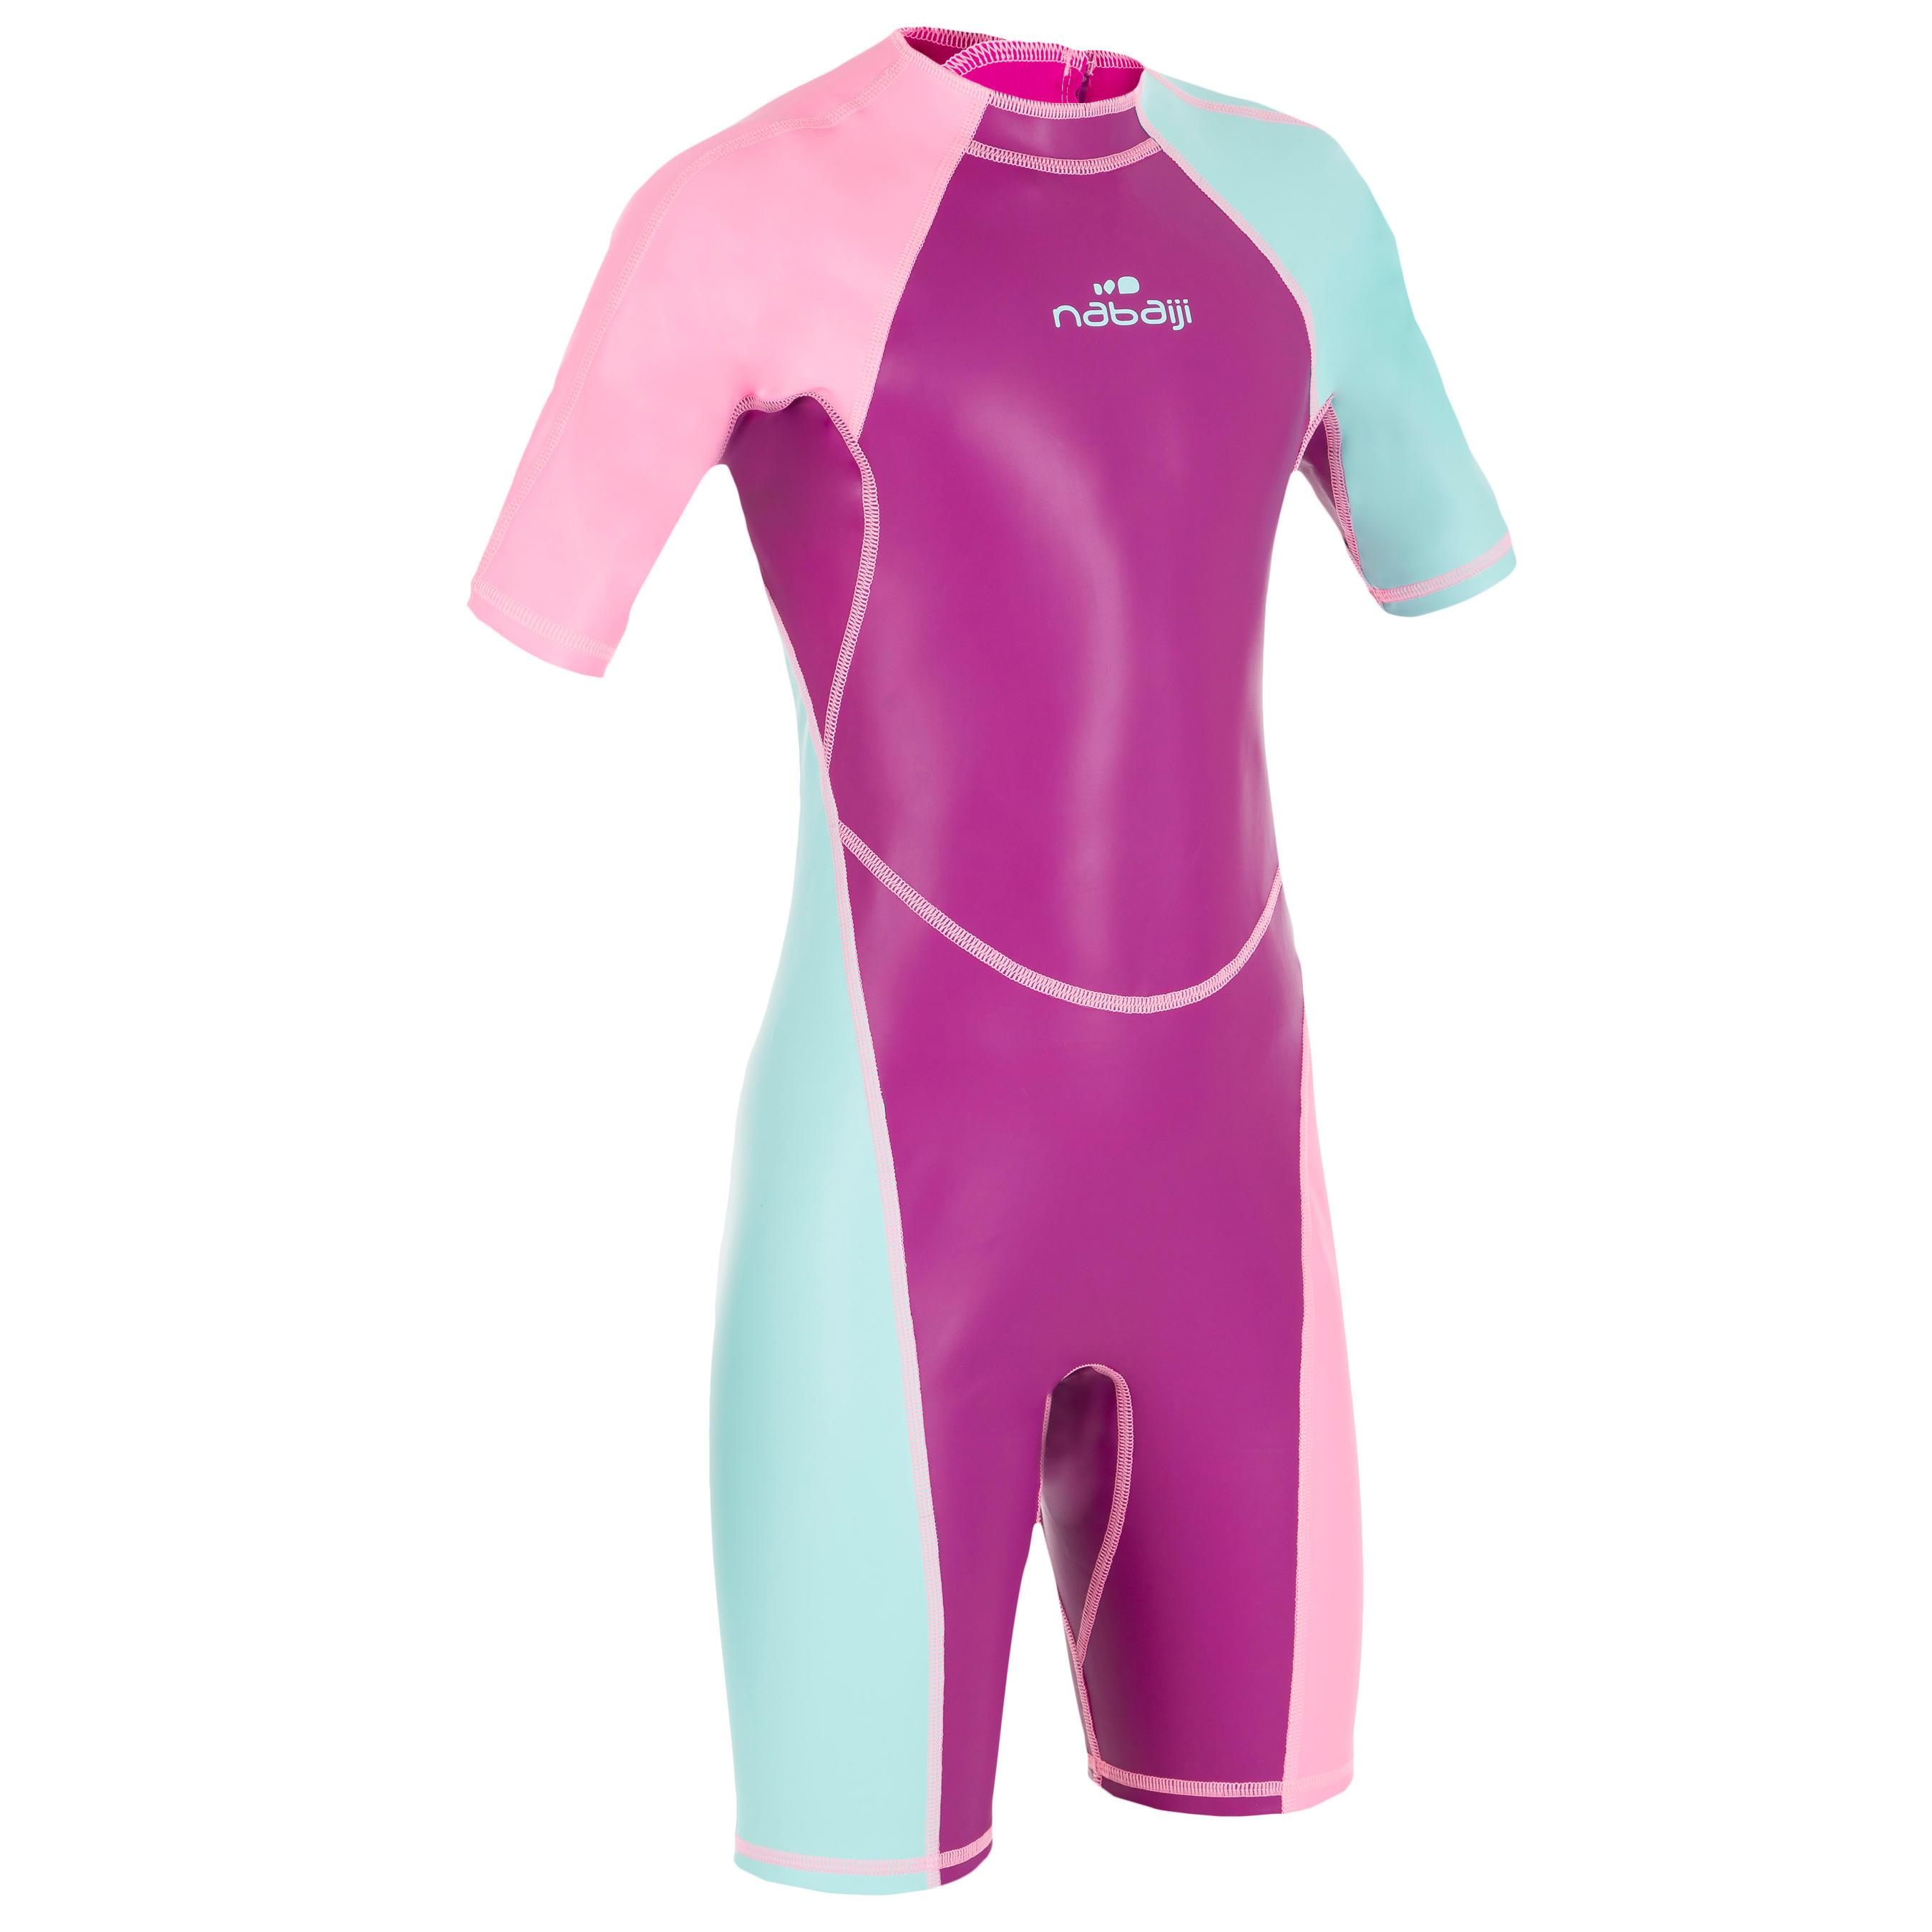 Mädchen,Kinder Schwimmanzug Shorty Kloupi Mädchen violett/rosa | 03583788260776